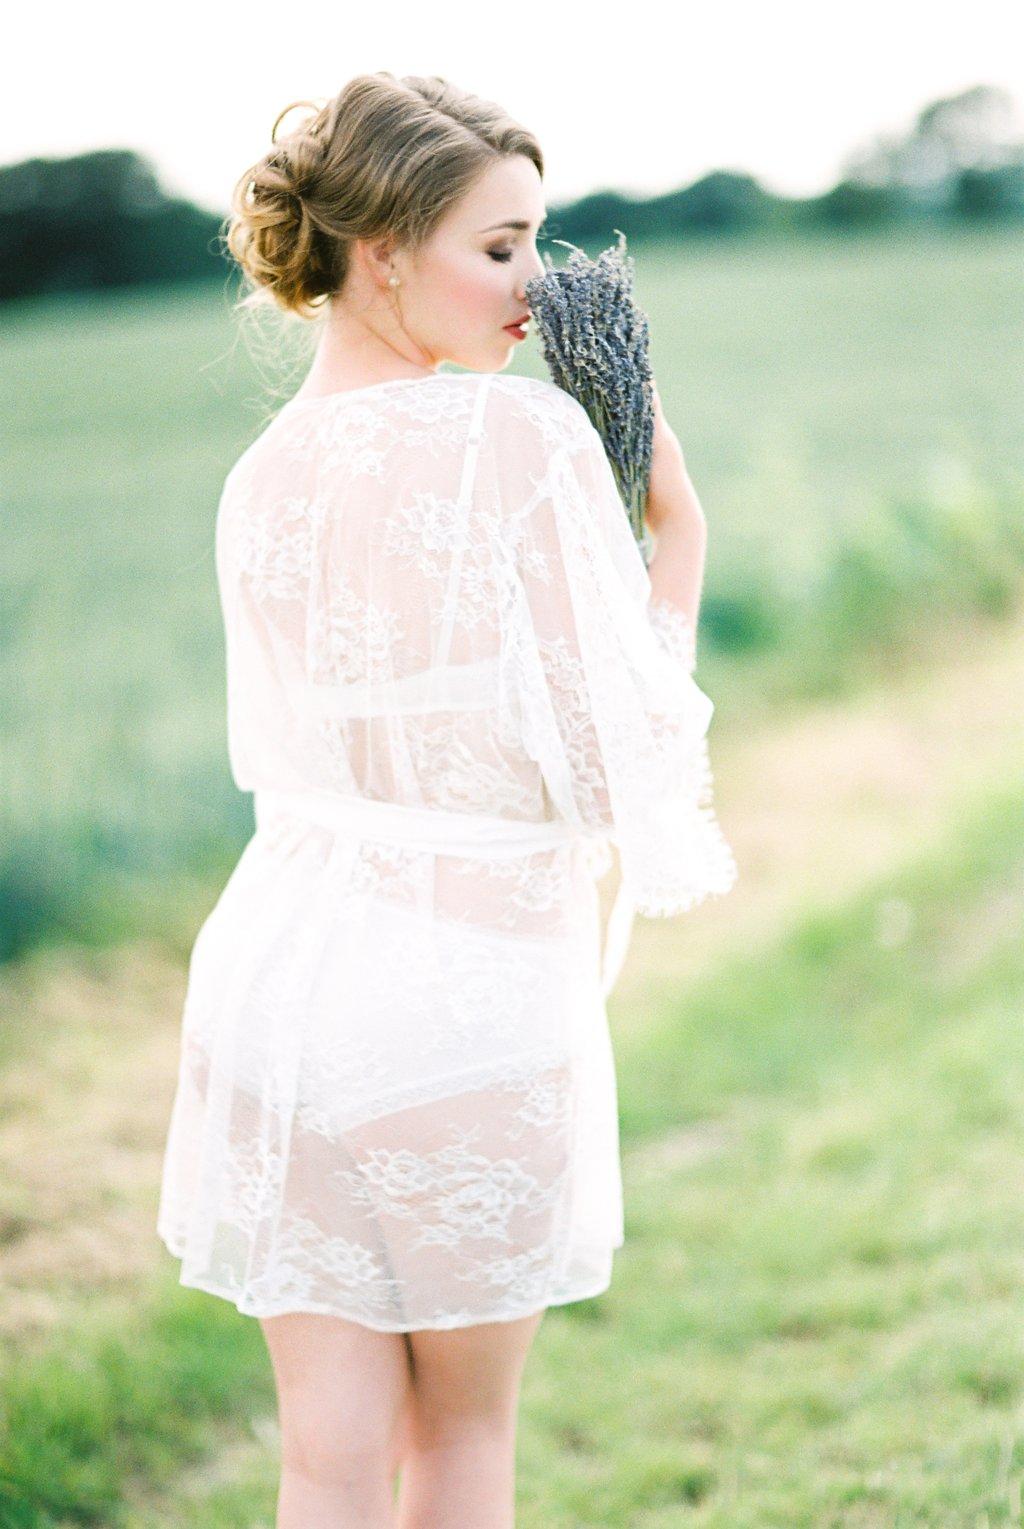 53b0fbfa3fe PROMO EXCLU   VICTORIA lace robe - Chantilly lace robe - bridal lace robe - lace  kimono - bridesmaid robe